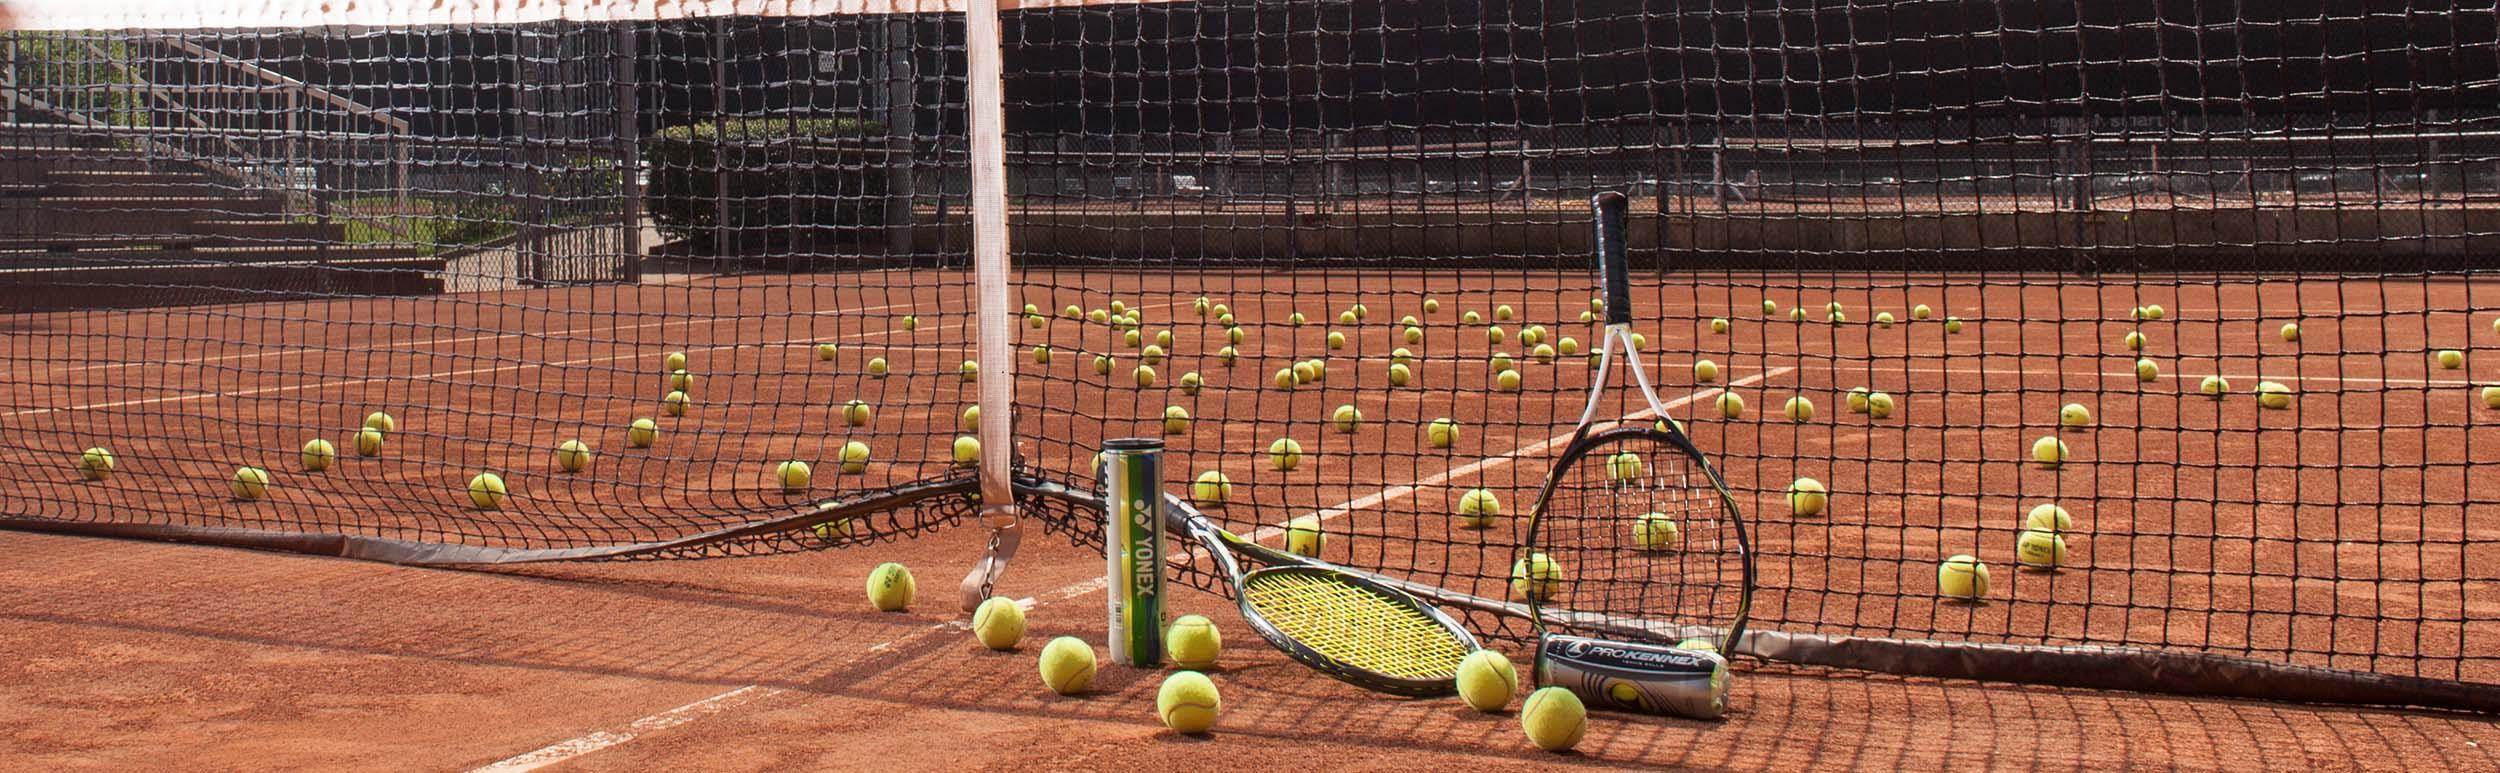 At Vantage Tennis Academy - Header